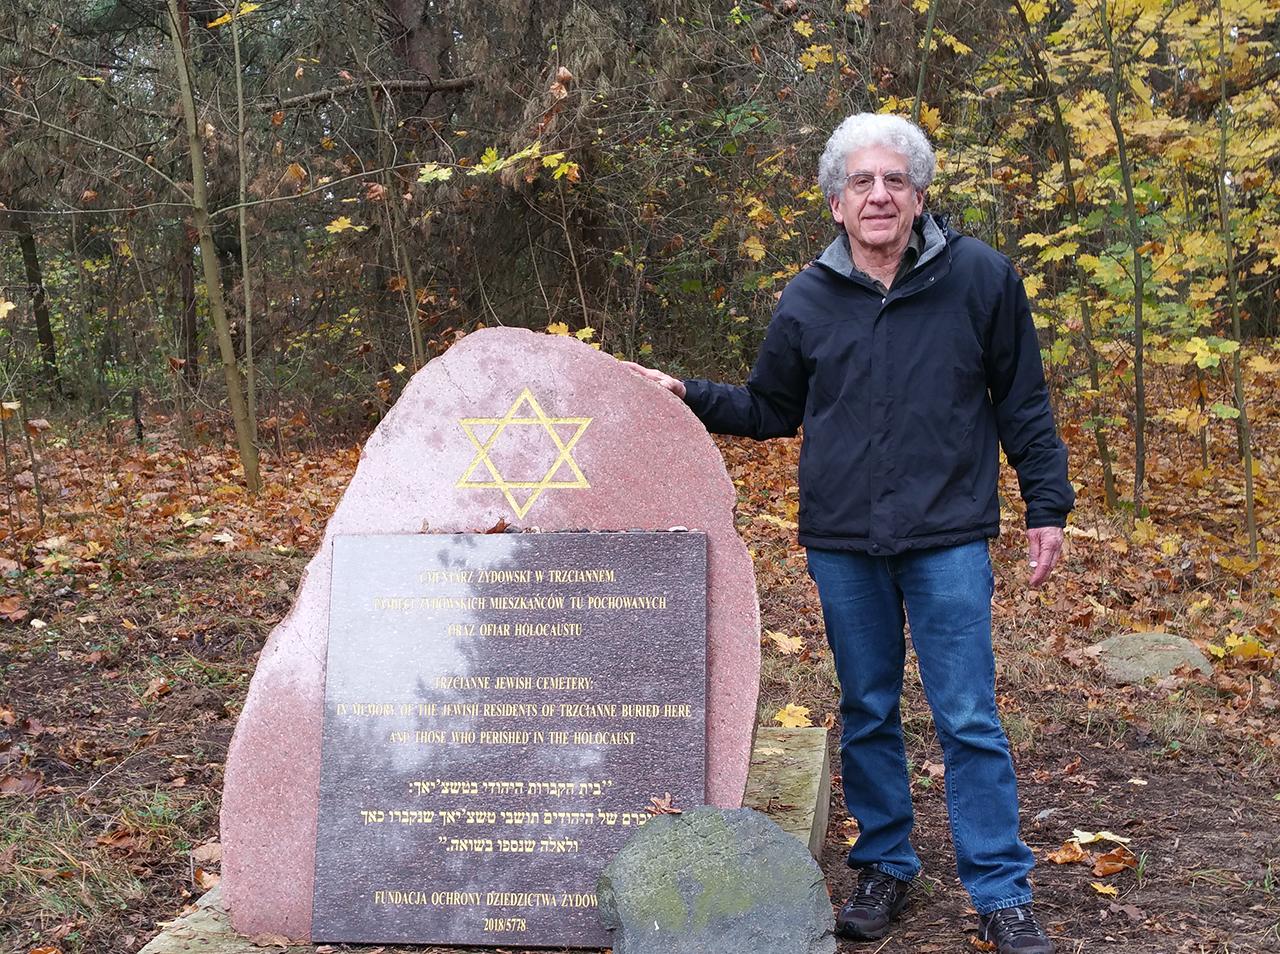 Bill Brostoff at the Jewish cemetery in Trzcianne, Poland.